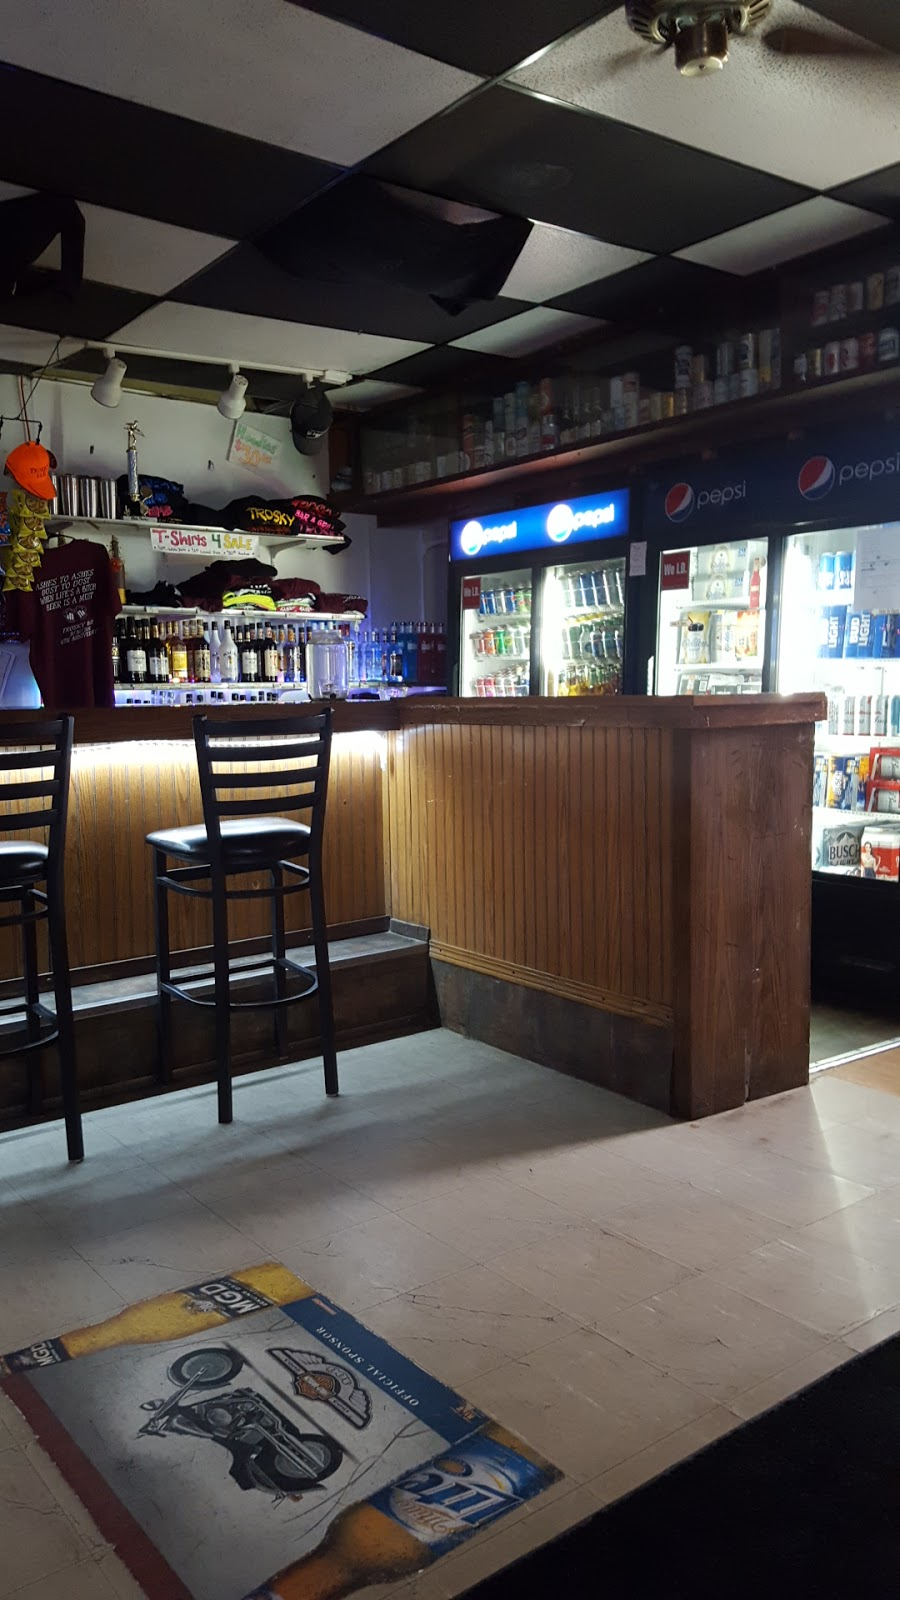 Trosky Bar & Grill | restaurant | 201 Broadway St, Trosky, MN 56177, USA | 5073487468 OR +1 507-348-7468